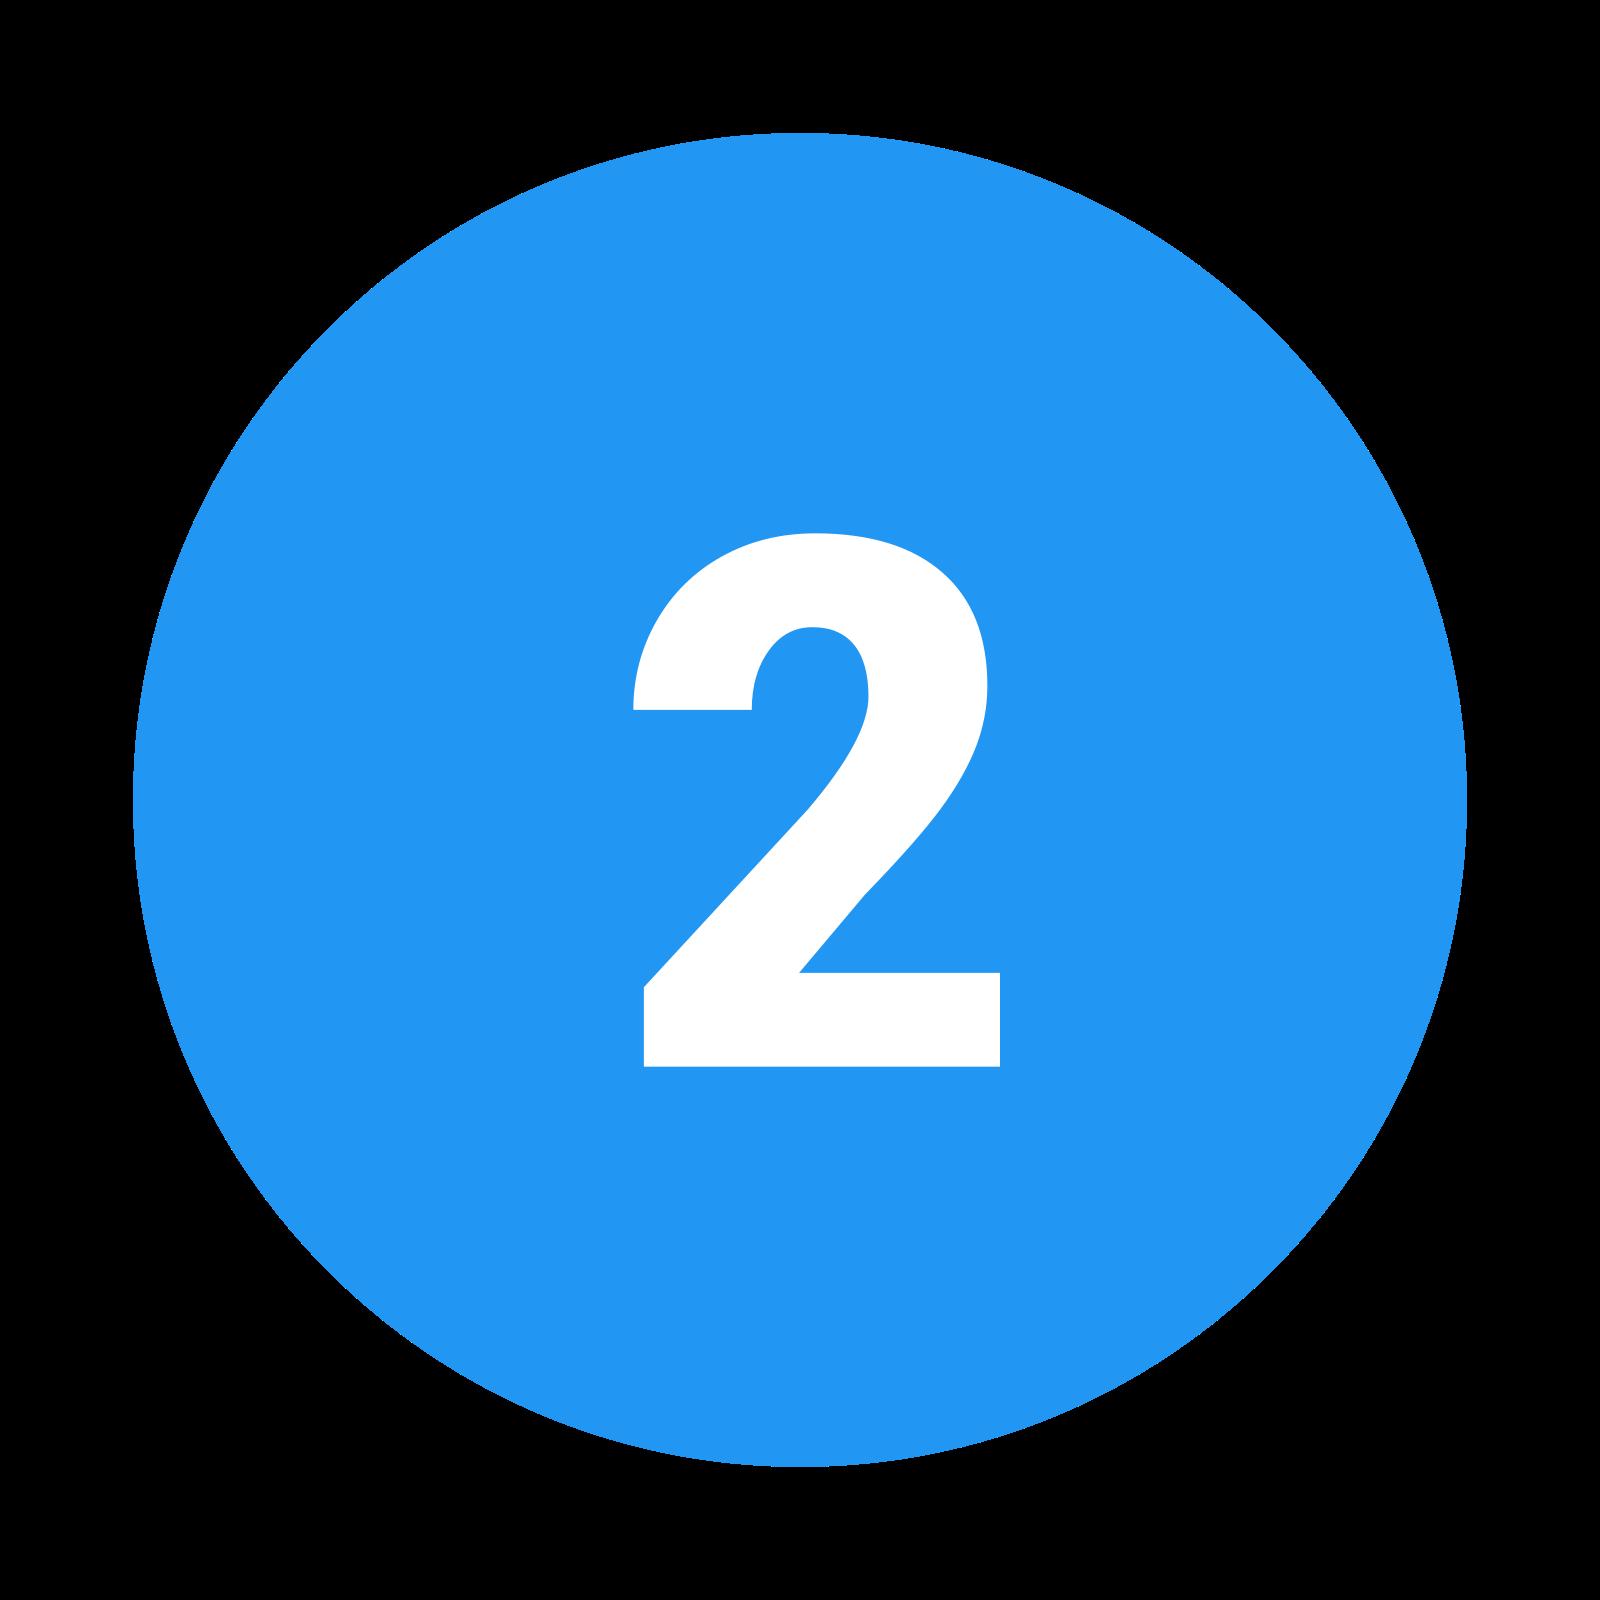 2 C w kółku icon